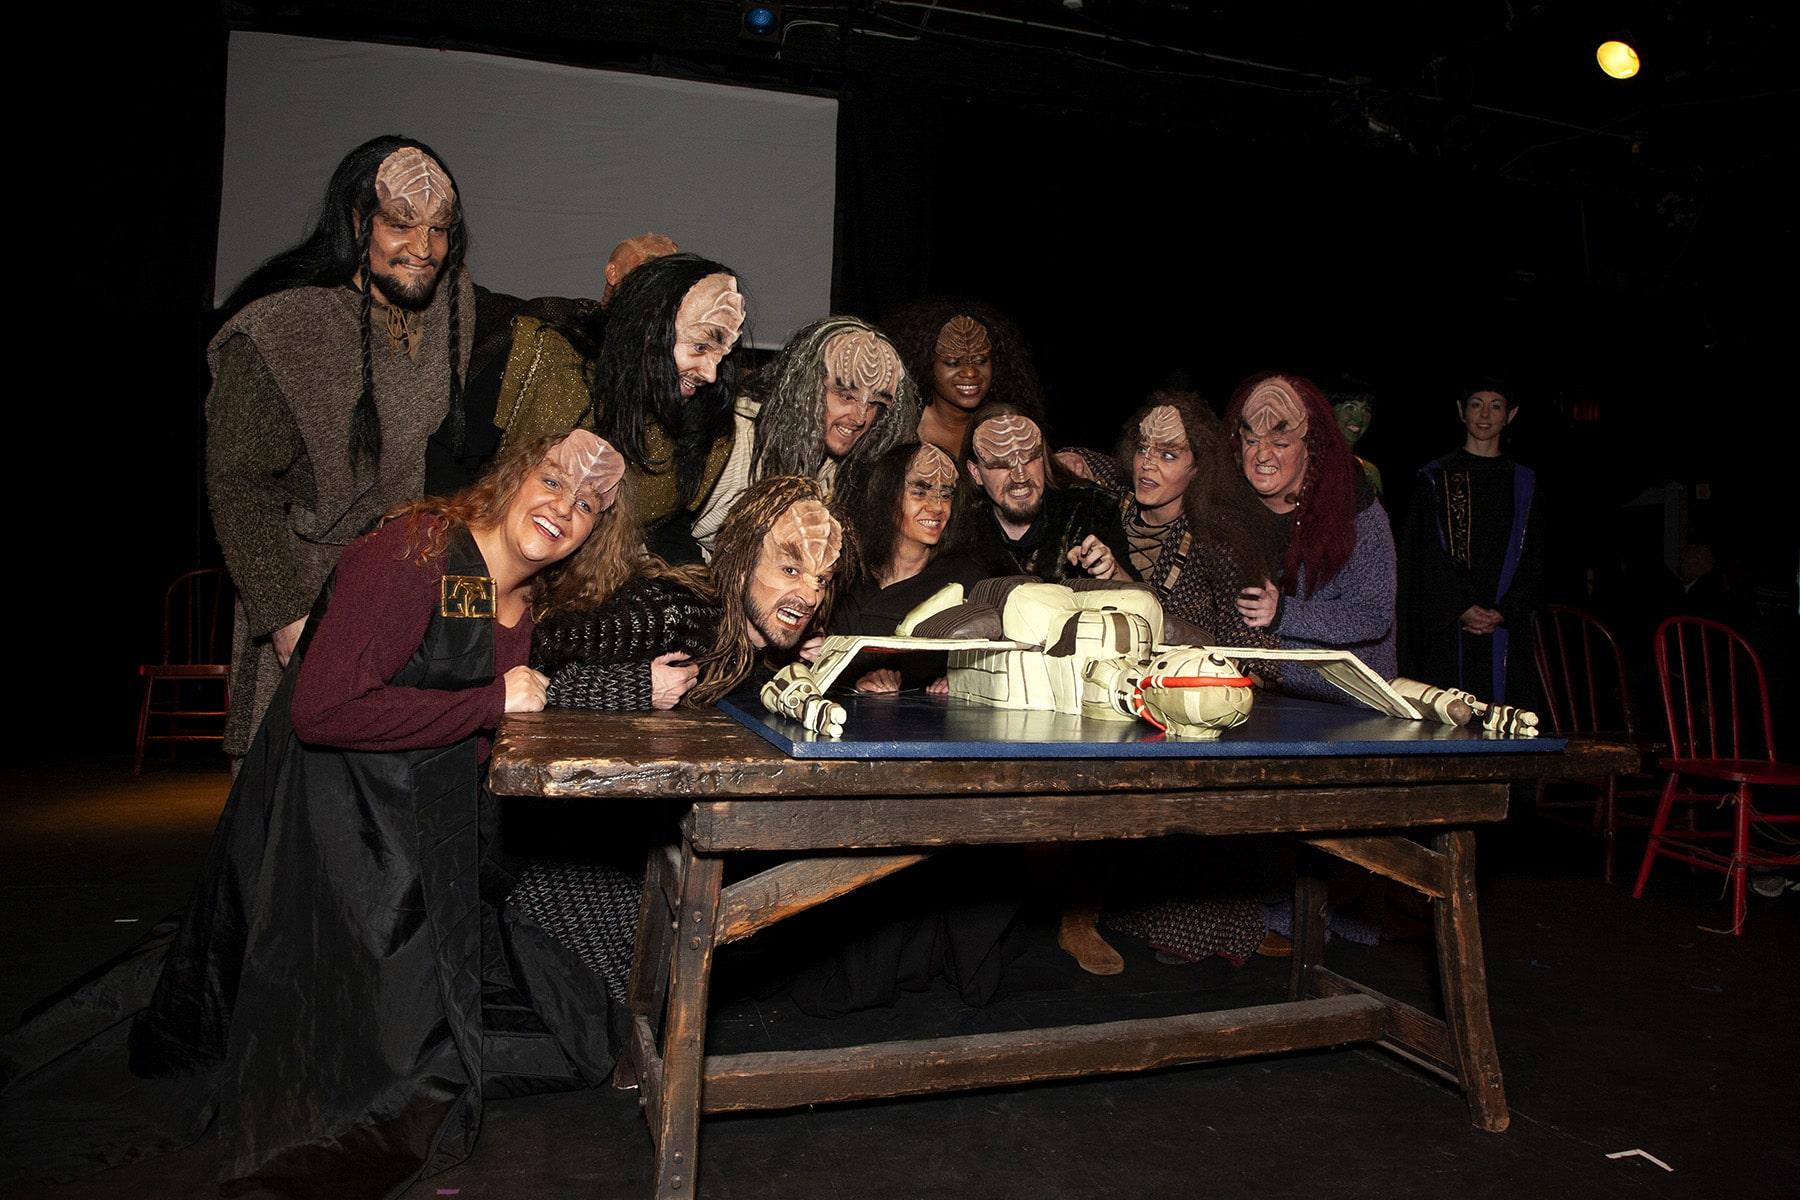 A group of Klingons gathered around a table. on the table is the Klingon ship cake.